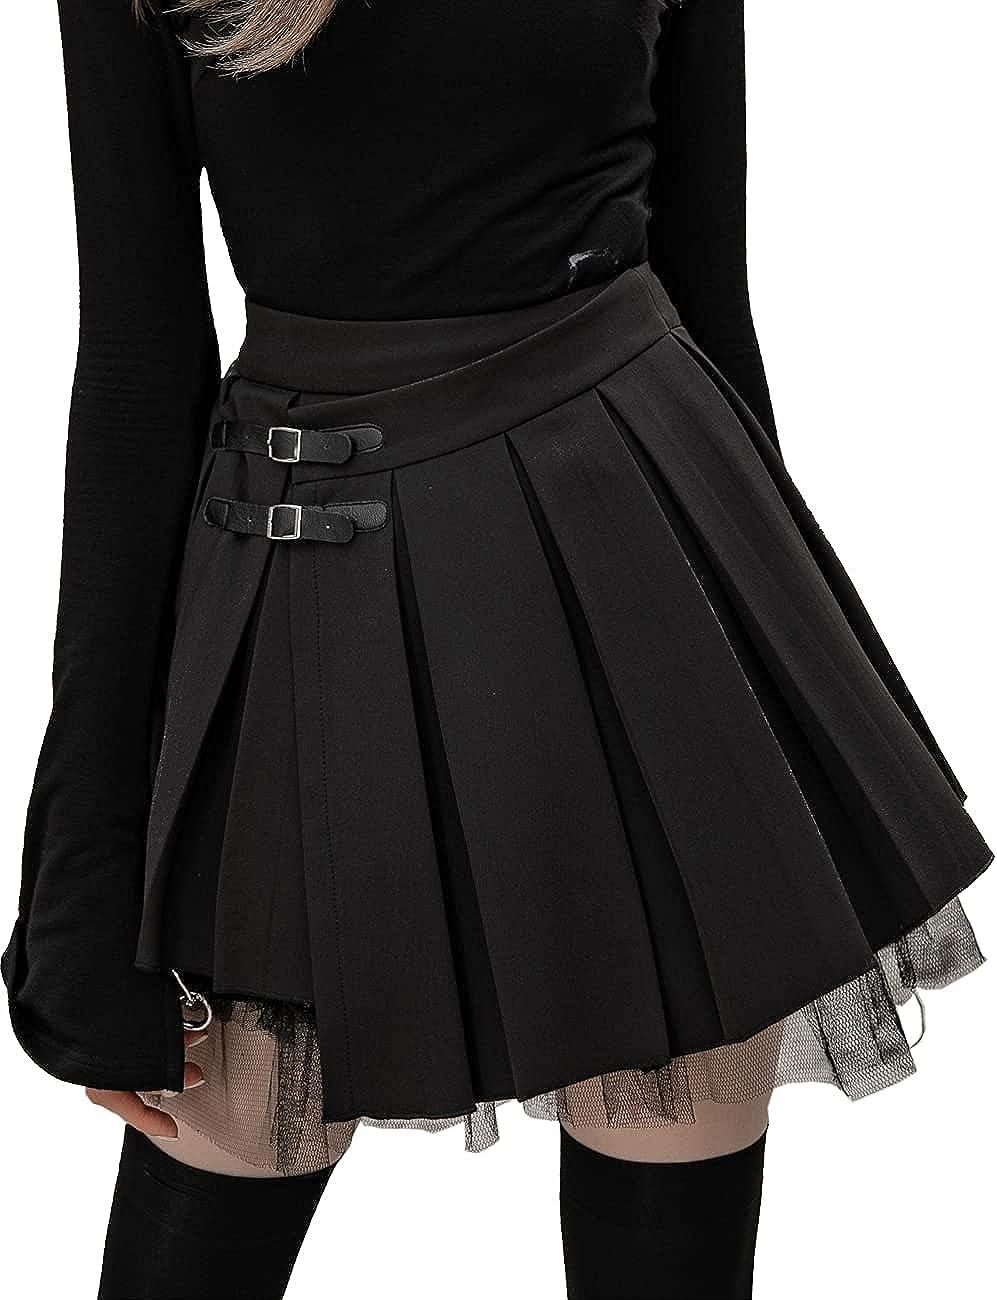 Punk Rave Women High Waist Multi-Layer Pleated Half Skirt PU Buckle Lotus Edge Irregular Hem Mini Skirt